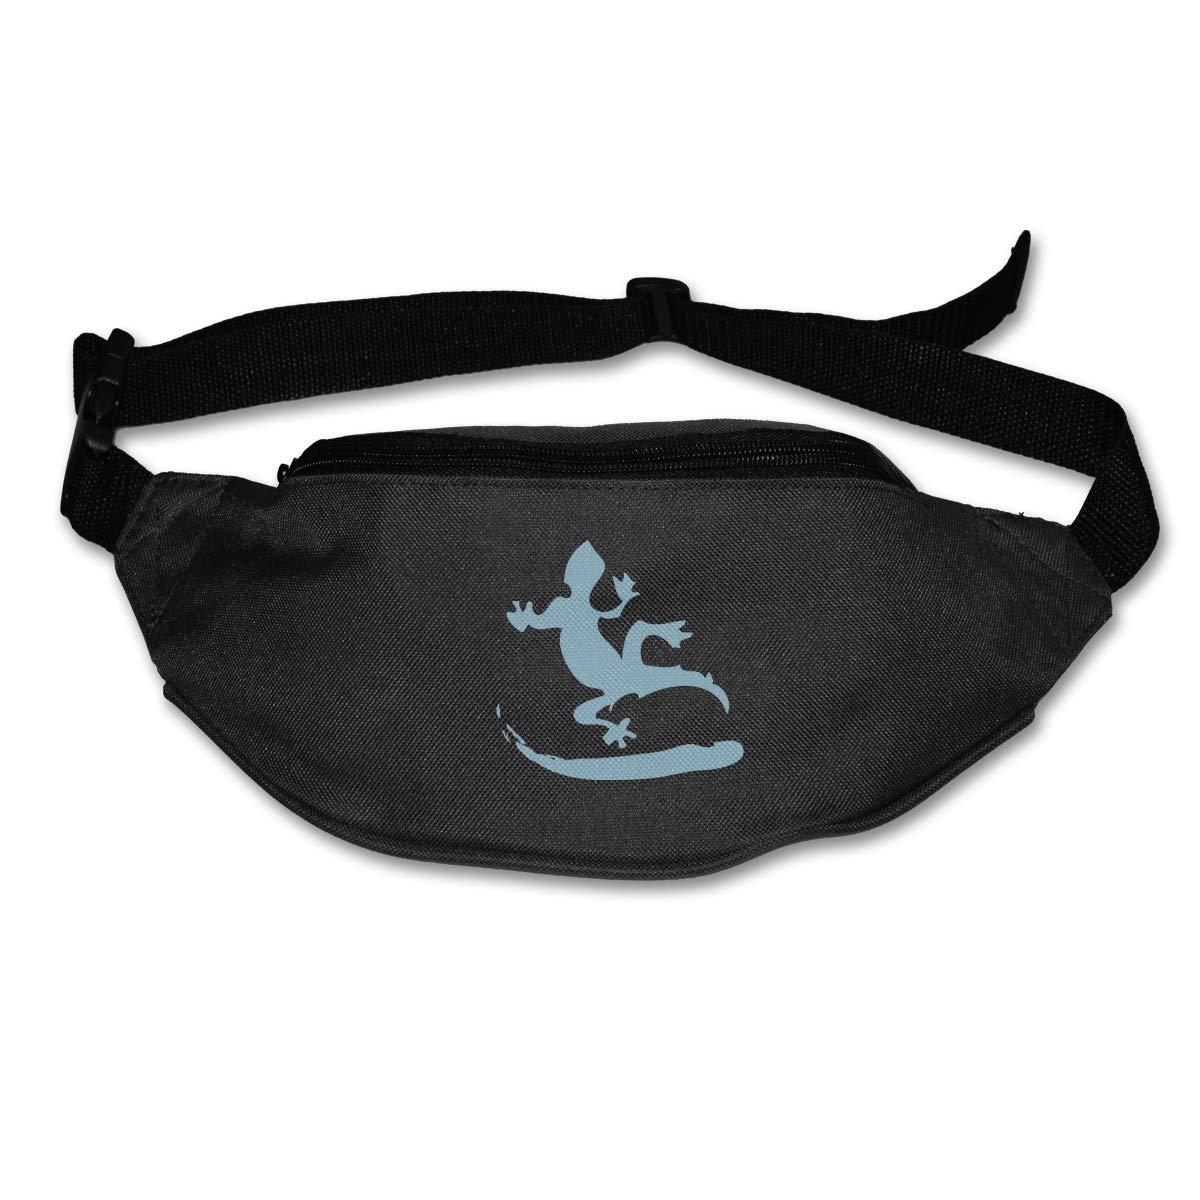 Wild Lizard Sport Waist Pack Fanny Pack Adjustable For Hike